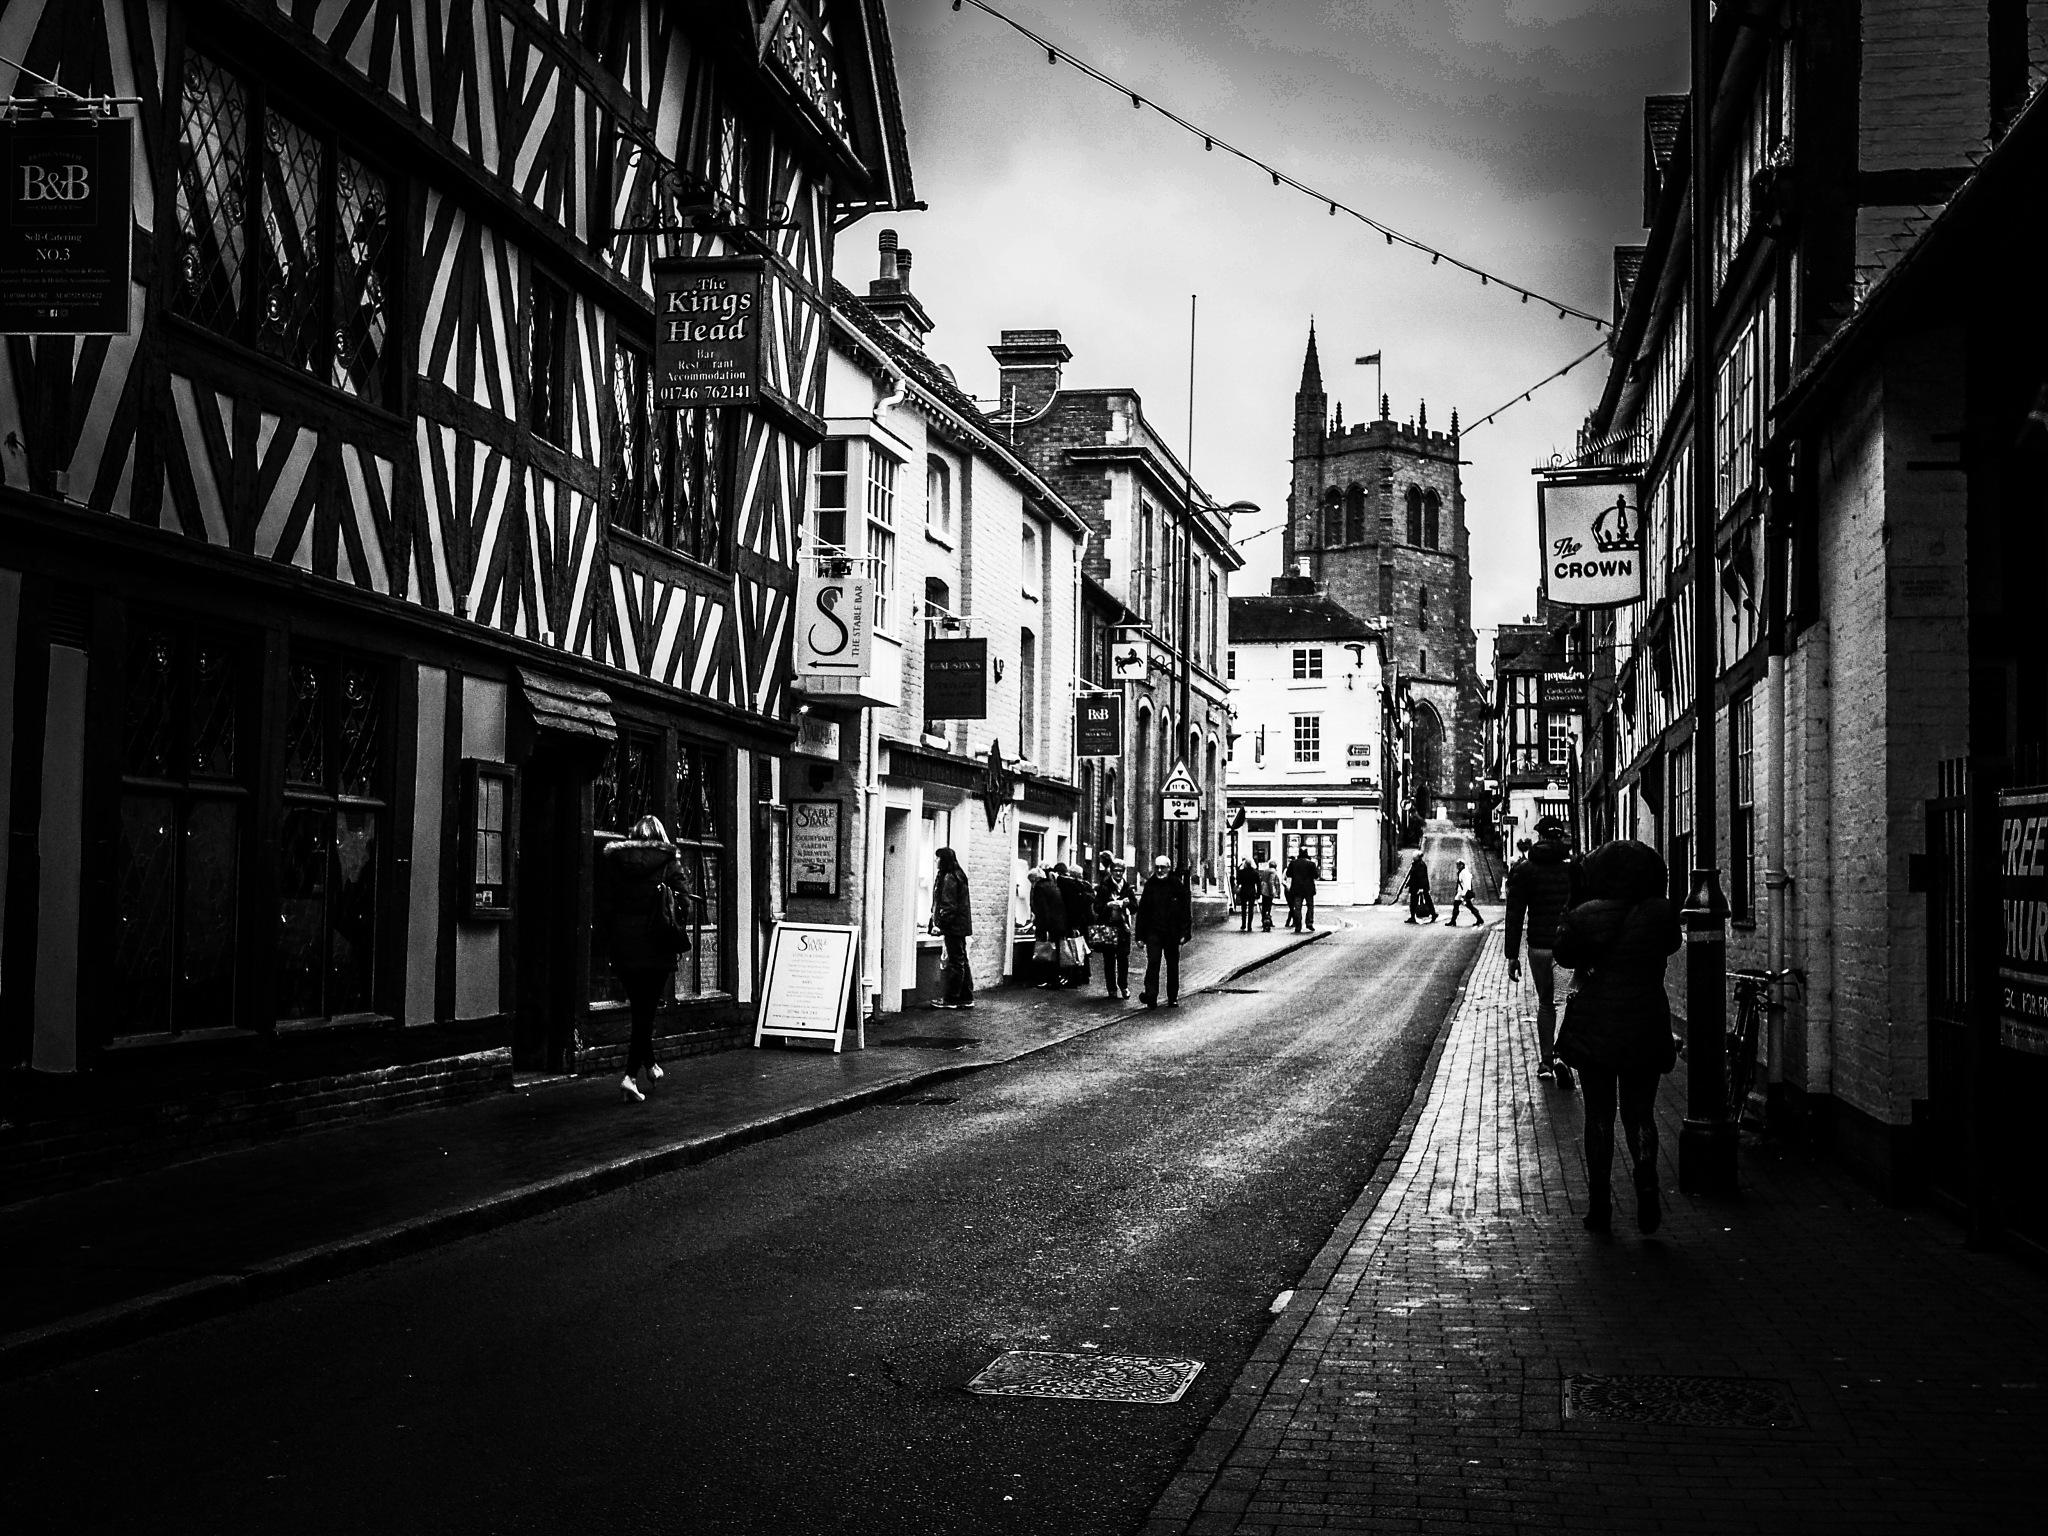 Street by Alan Turley